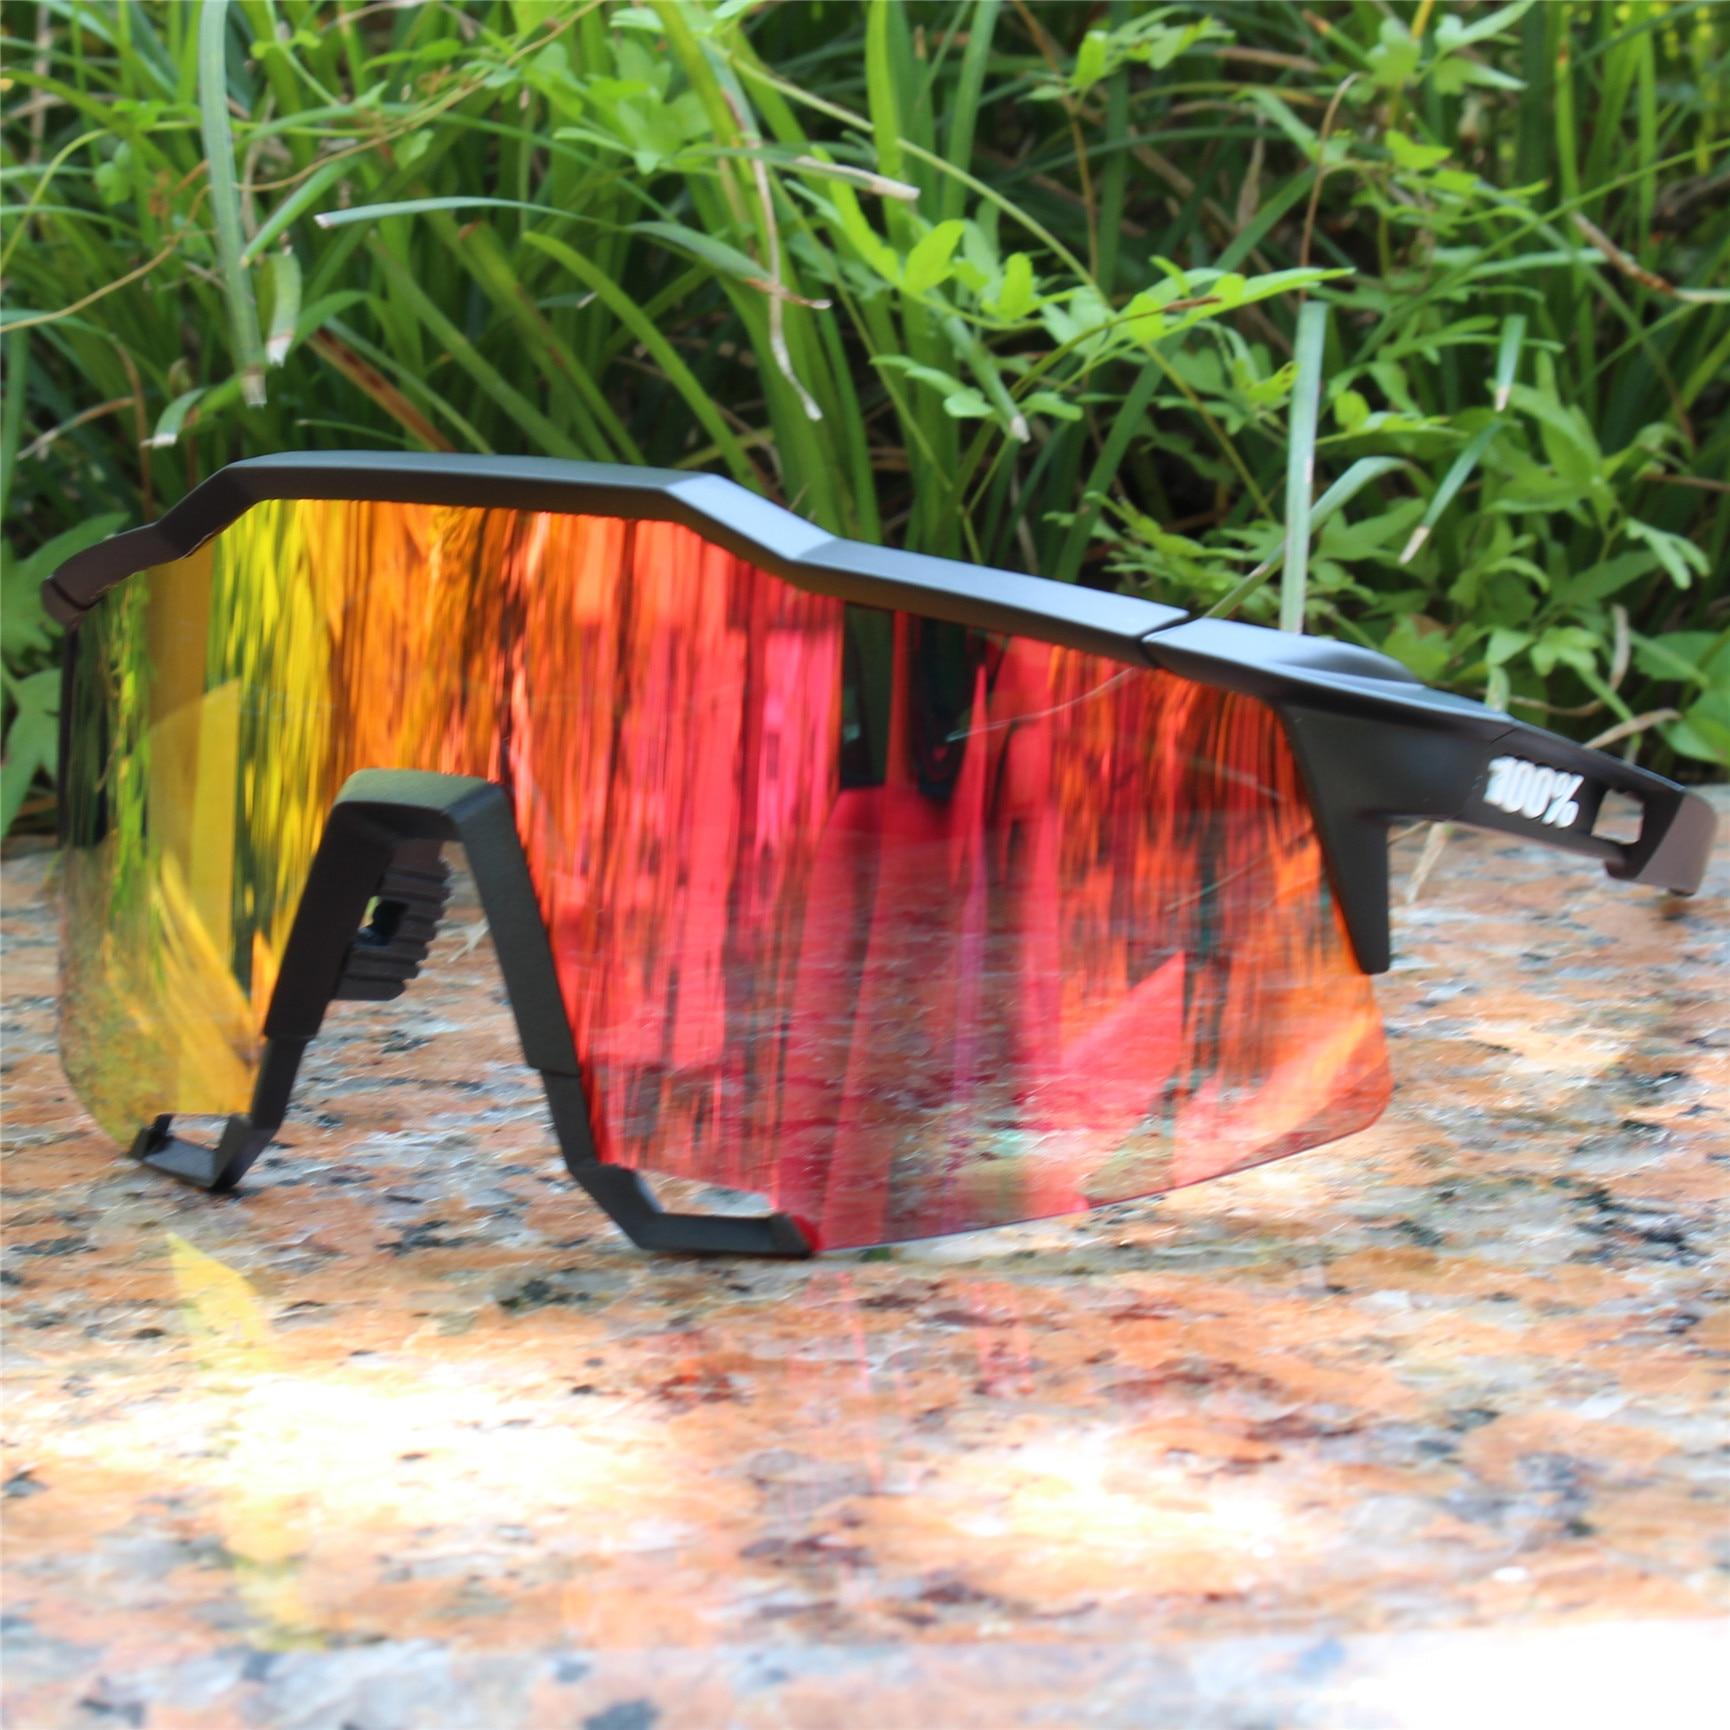 2017 100% SpeedCraft Brand  Base Outdoor Sports Bicycle Sunglasses MTB  Cycling Glasses Running Eyewear Full color 2 lens UV400 2016 top fashion trend women sunglasses brand new european american women s glasses goggle shades outdoor sports eyewear uv400